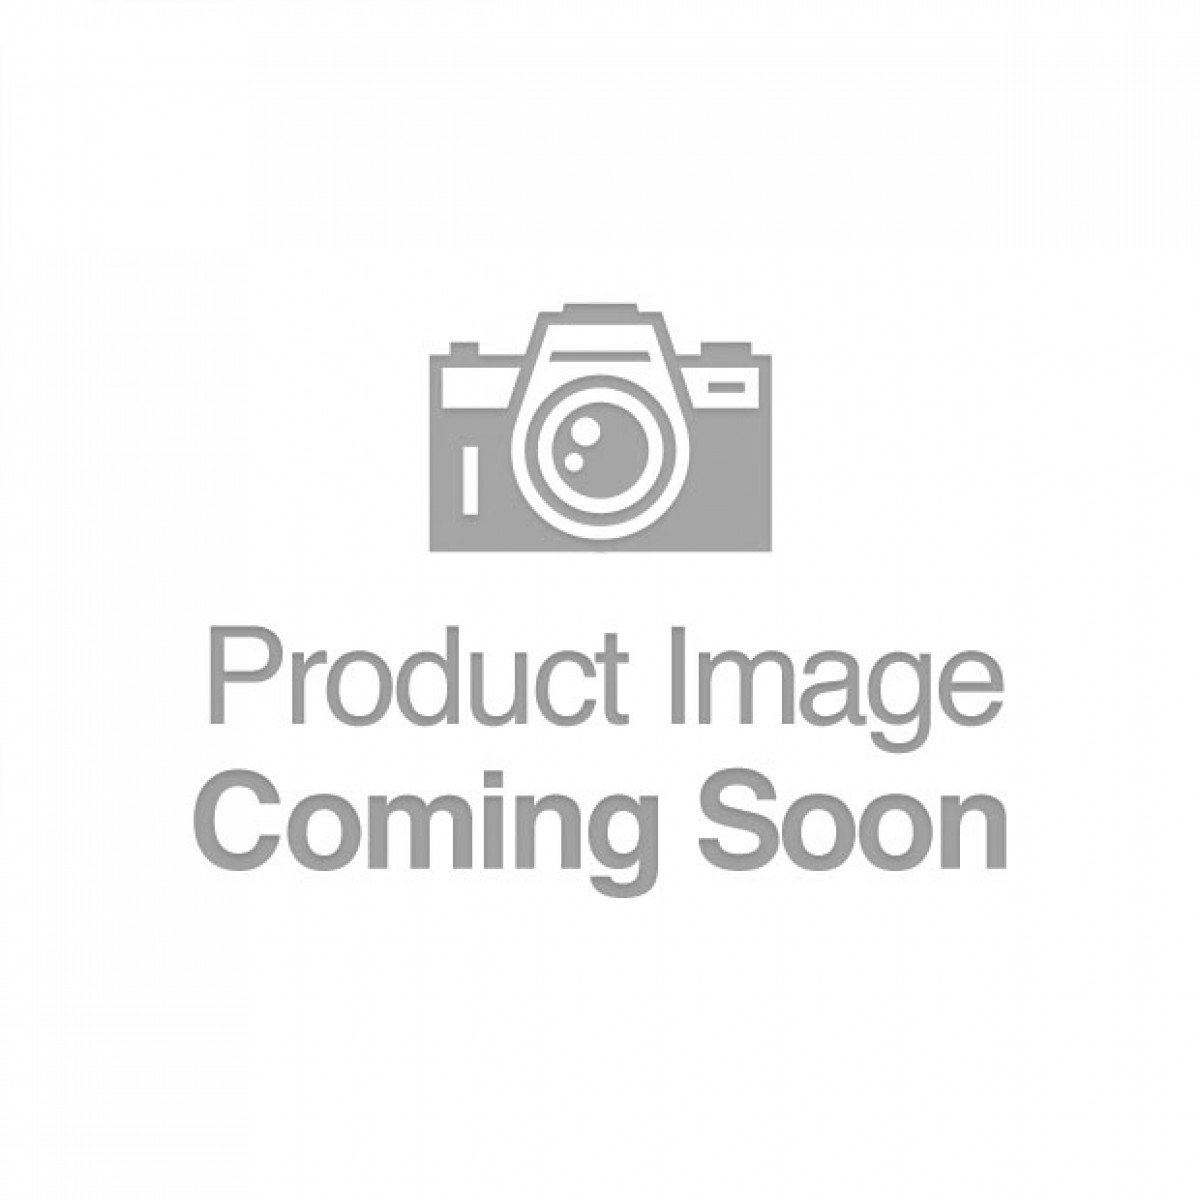 Sensuelle Power Plug 20 Function Remote Control Butt Plug - Navy Blue